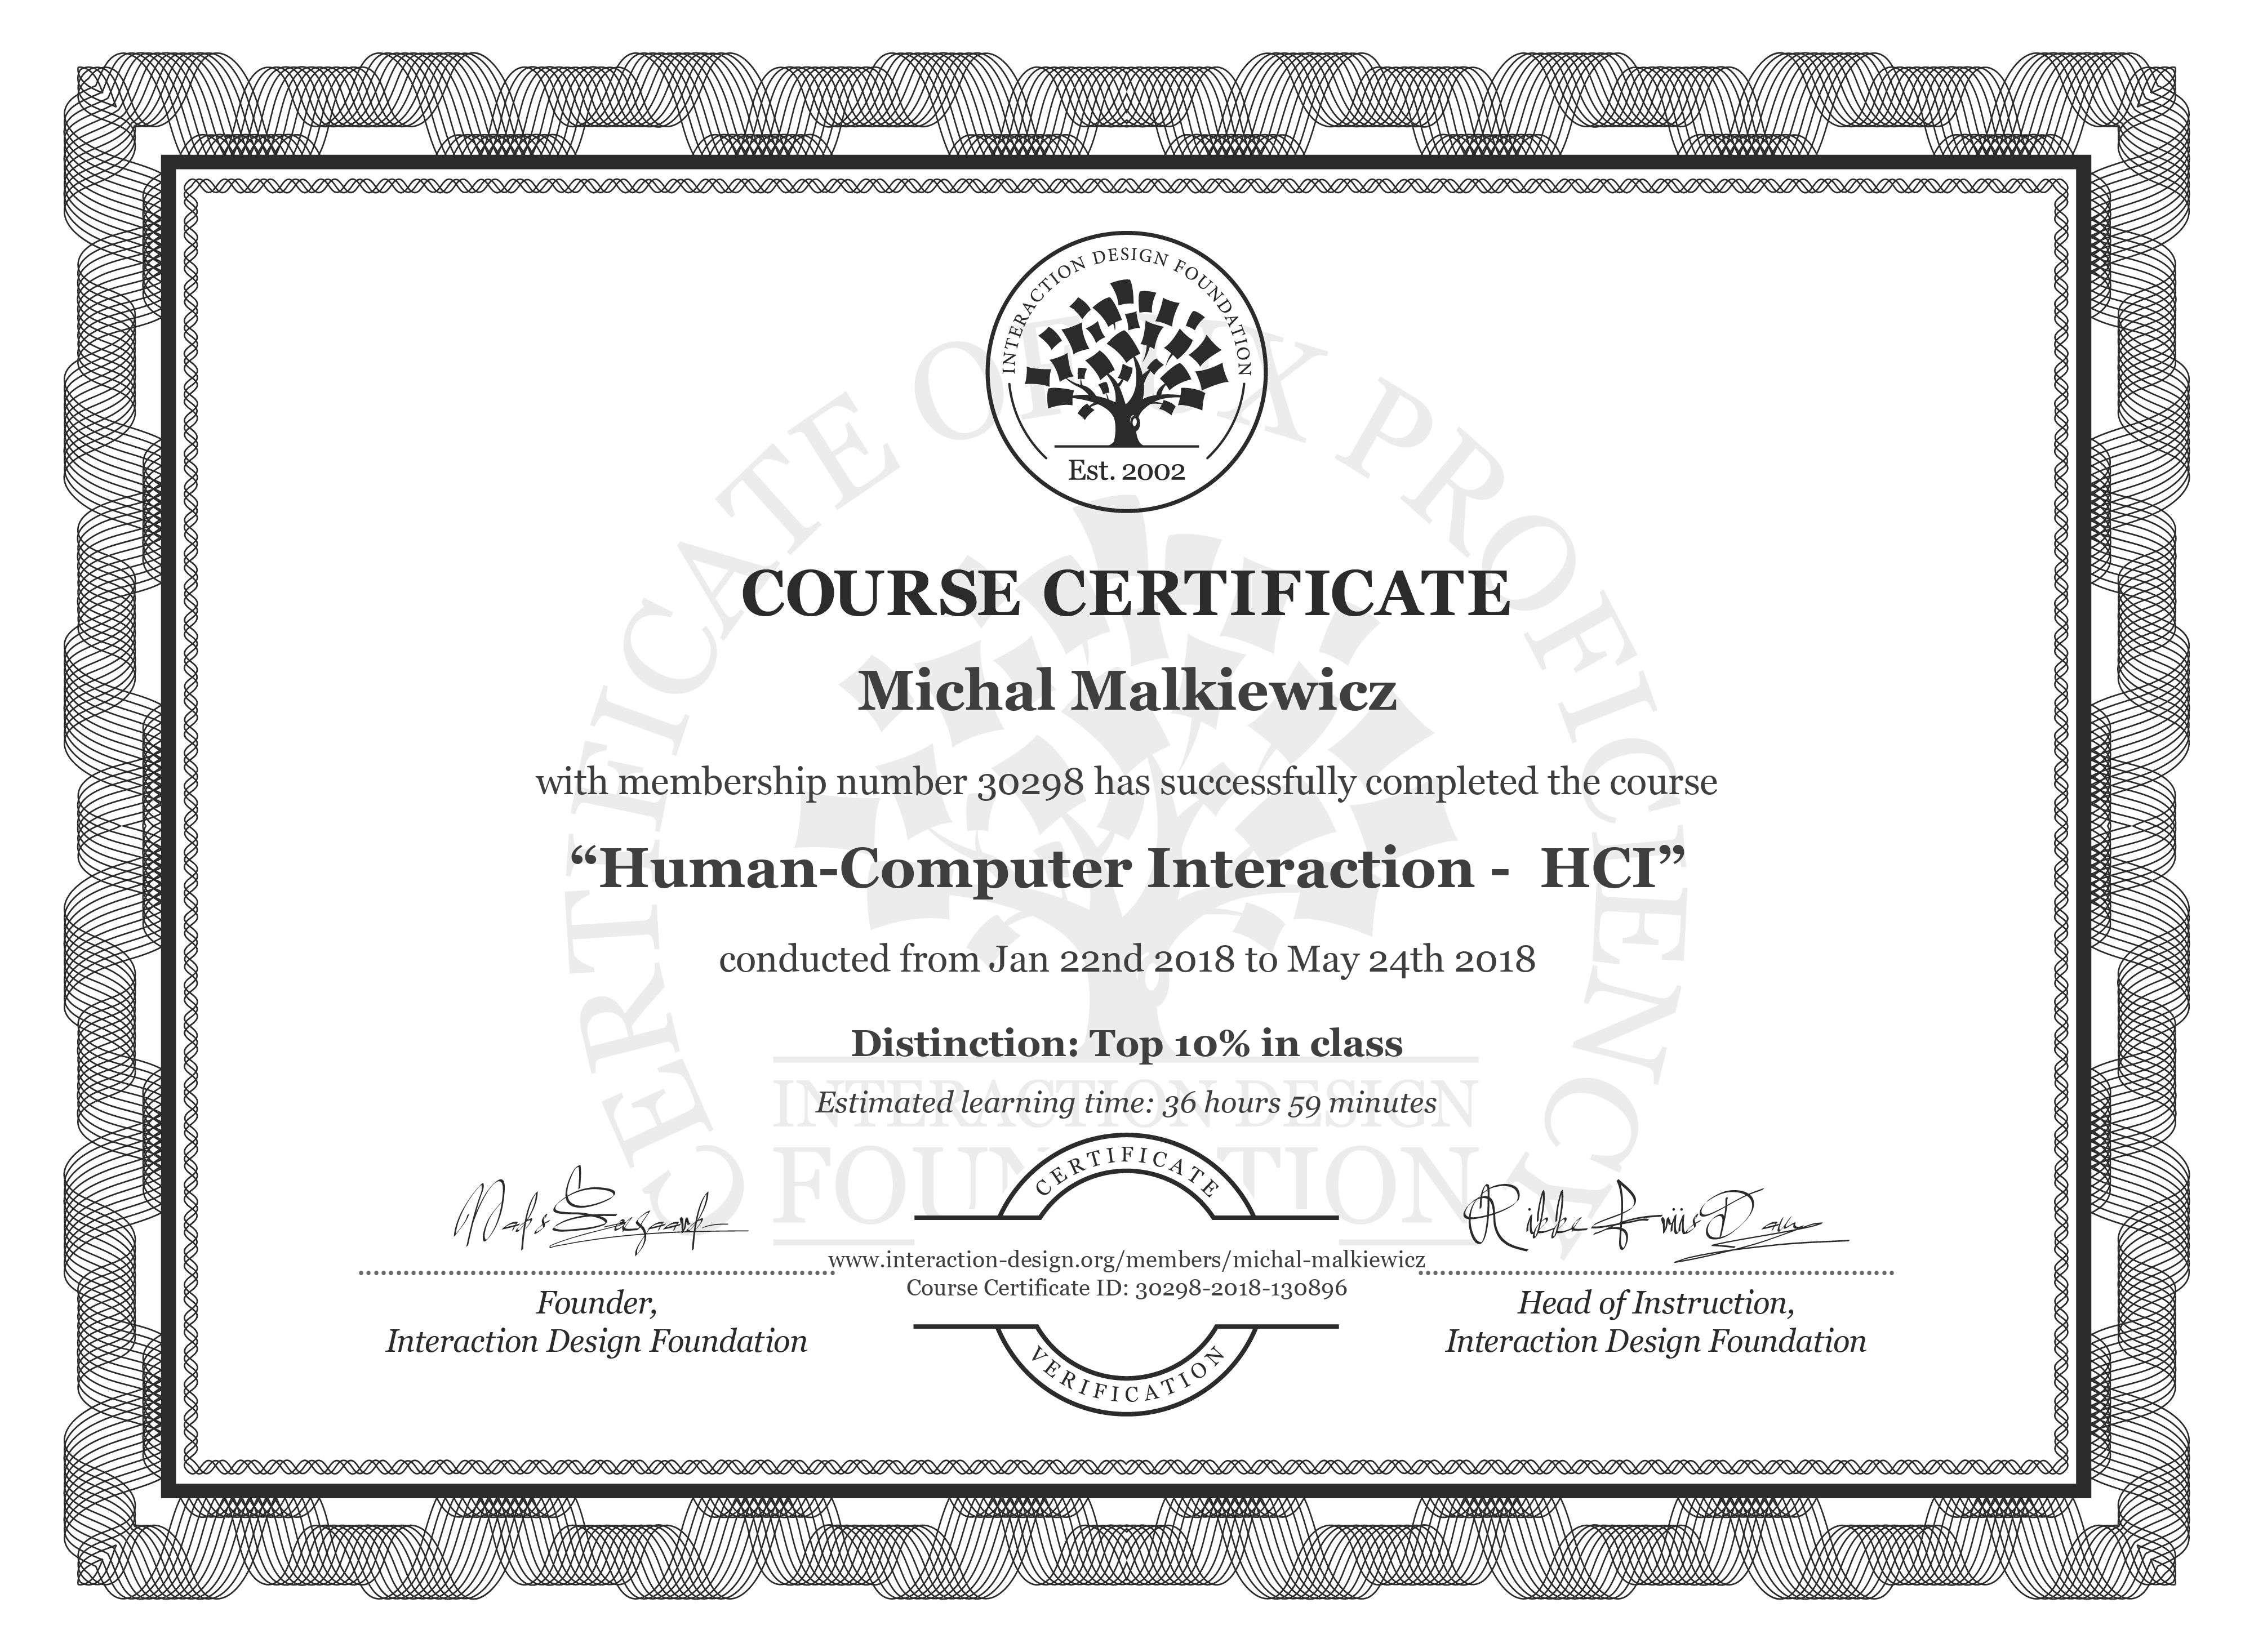 Michał Małkiewicz's Course Certificate: Human-Computer Interaction -  HCI